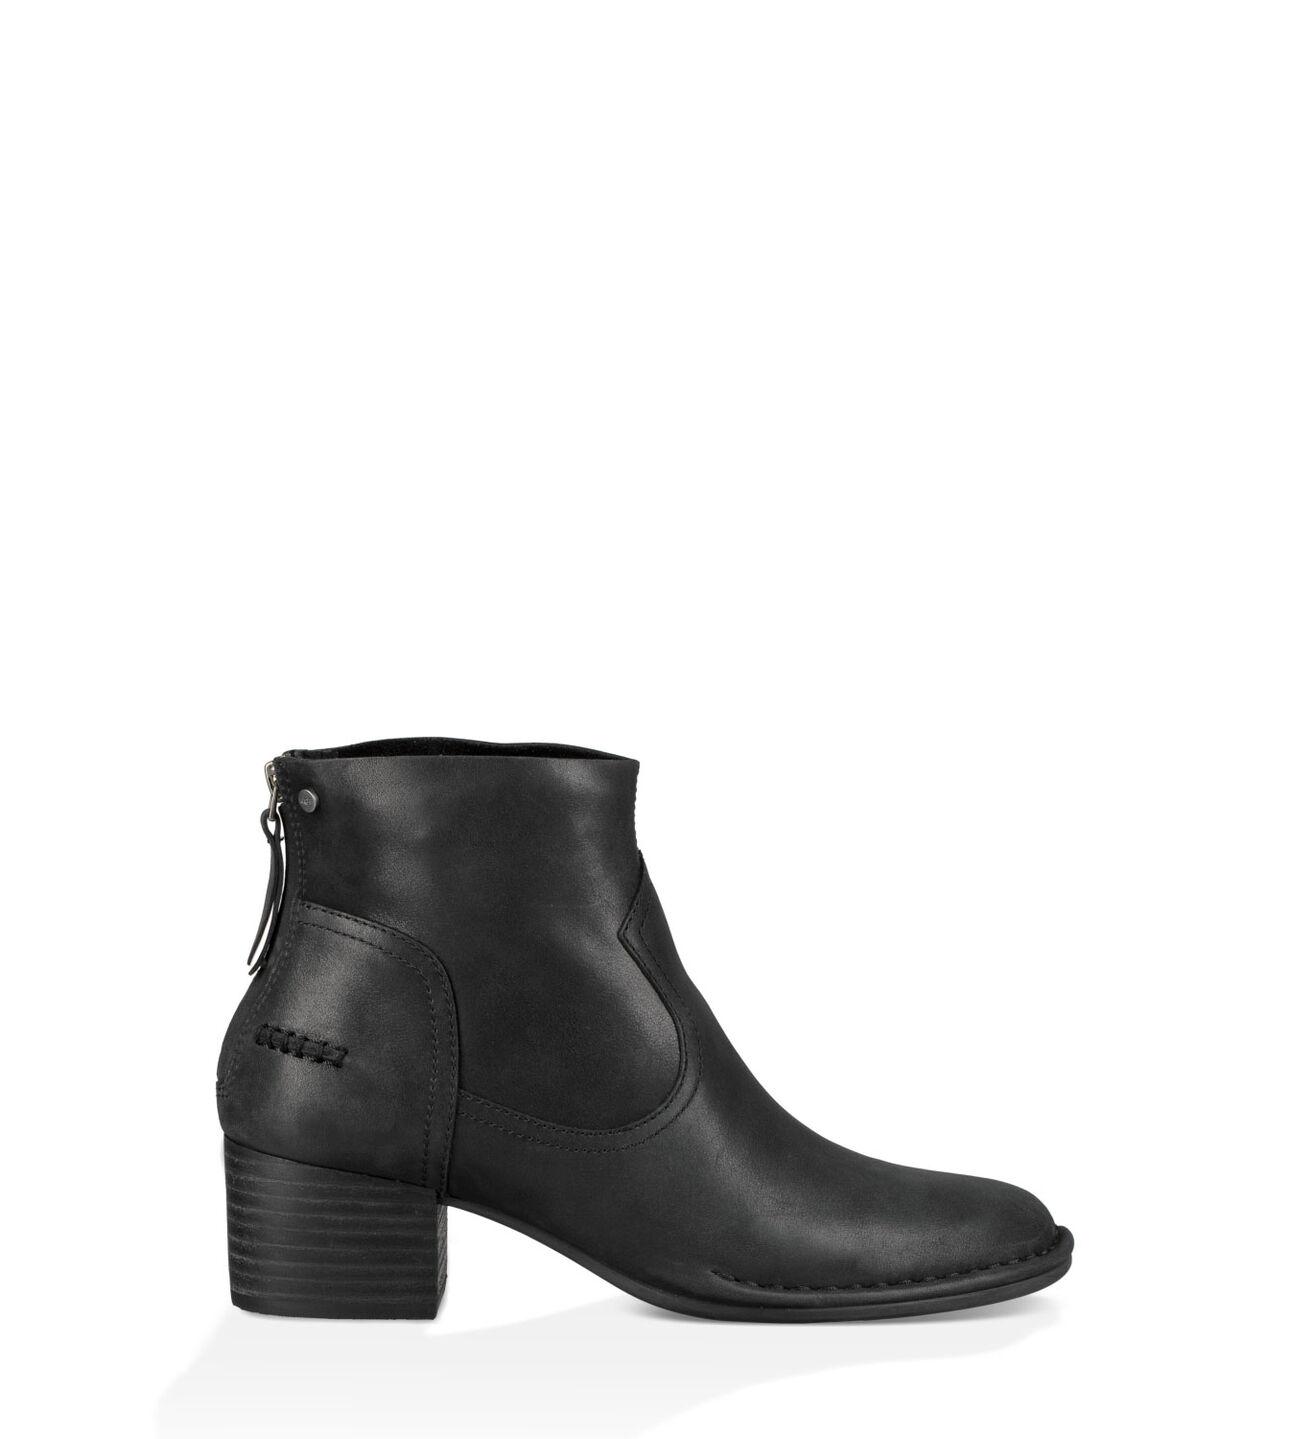 5132fcf18f1 Bandara Ankle Boot